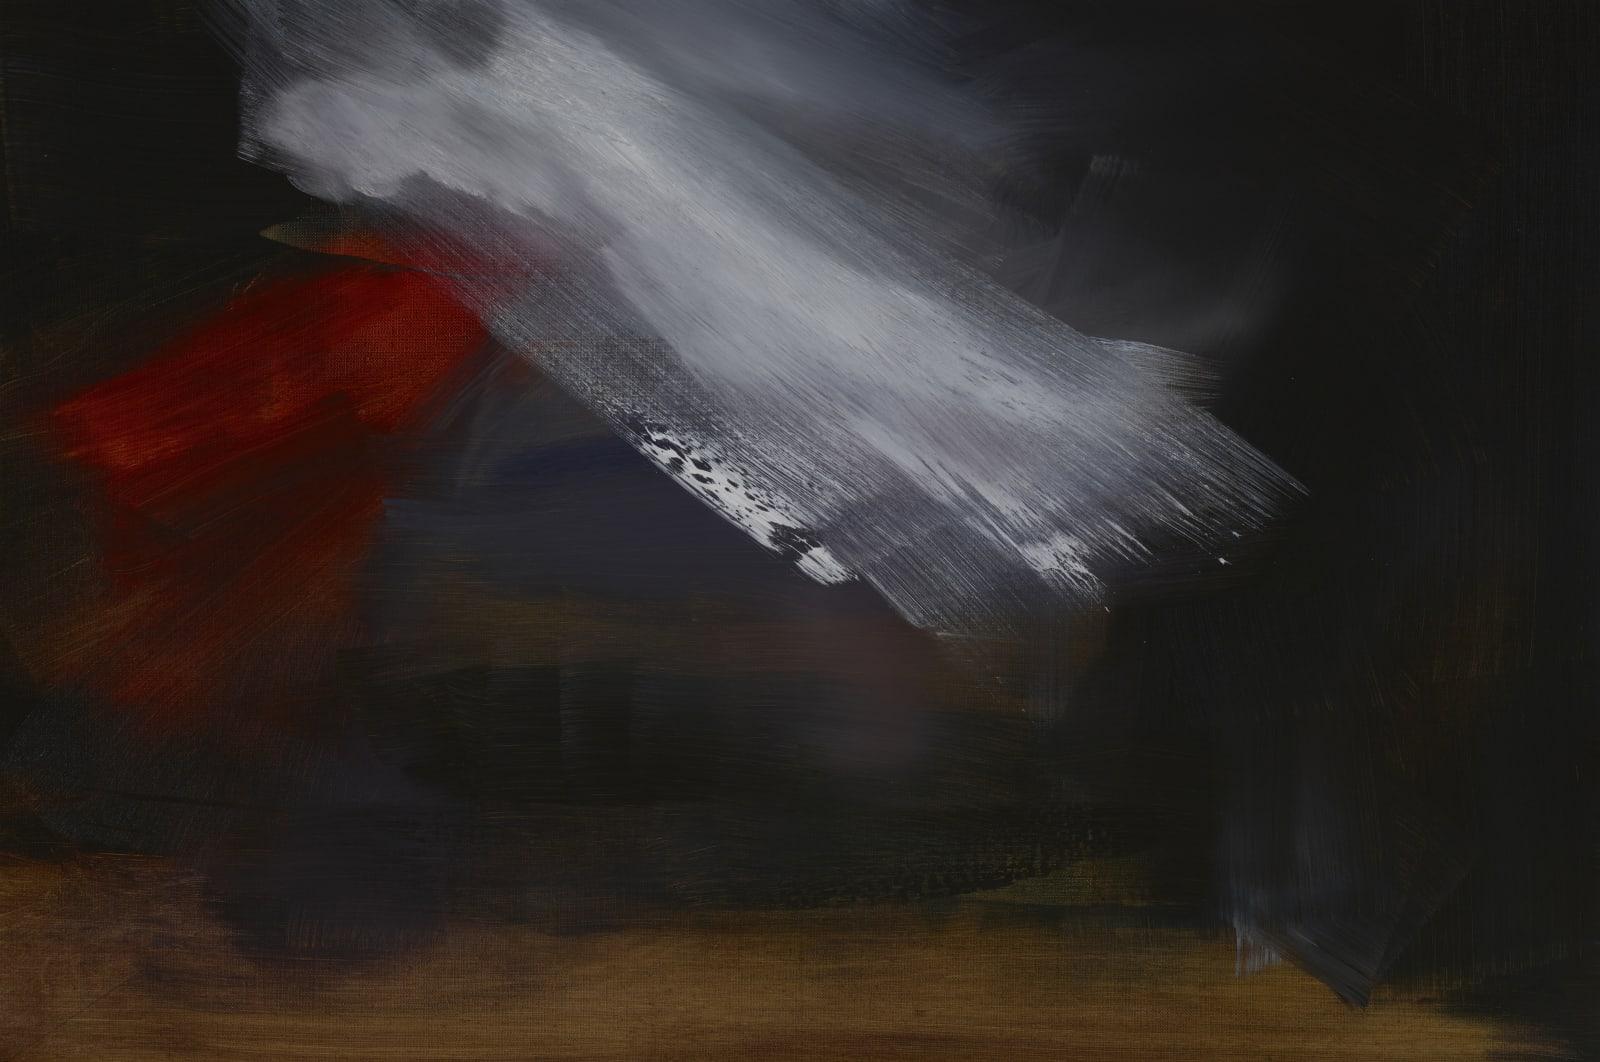 Medium Study for Yes oil on canvas 51cm x 76cm (20